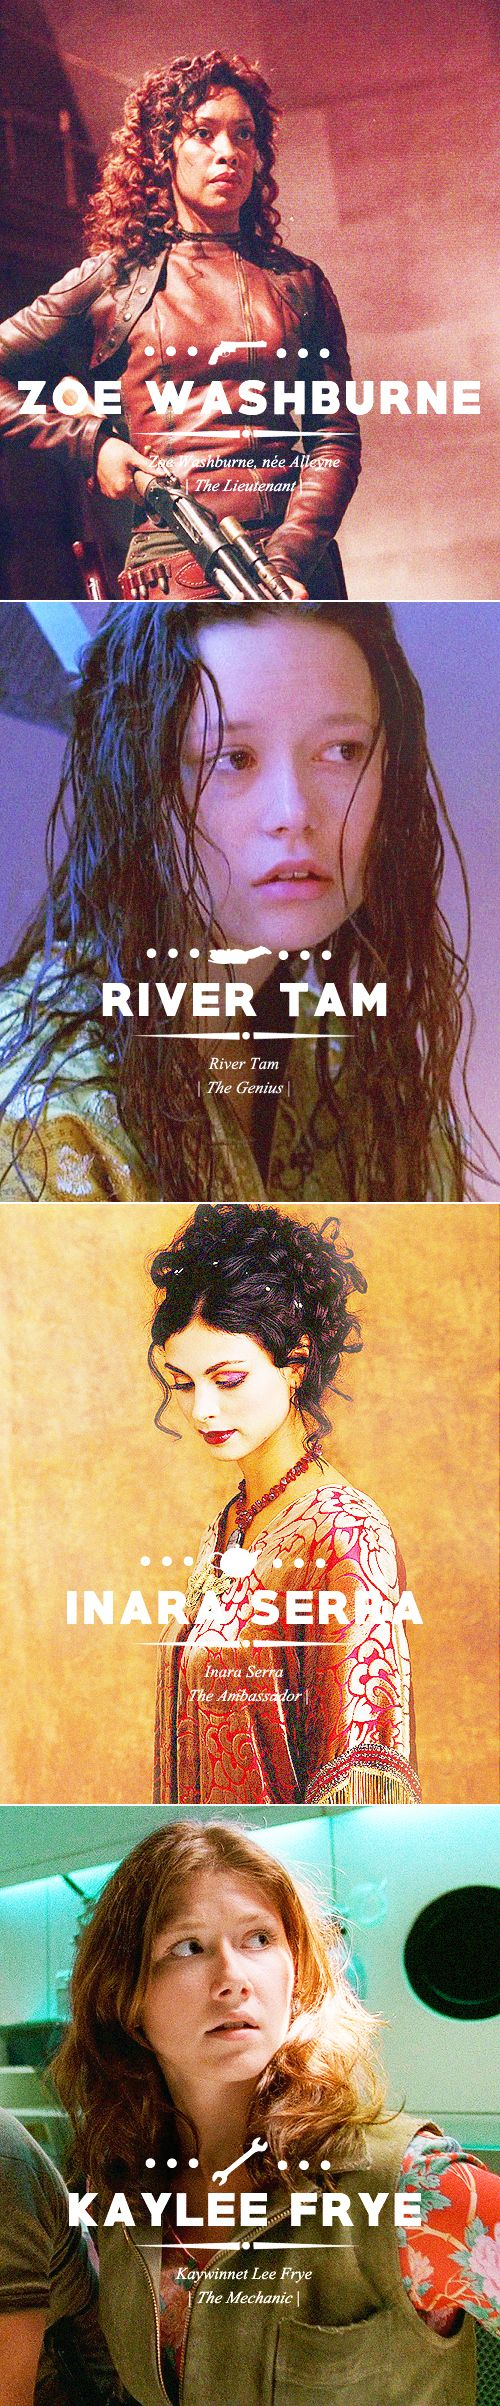 Zoe Washburne | River Tam | Inara Serra | Kaylee Frye #firefly